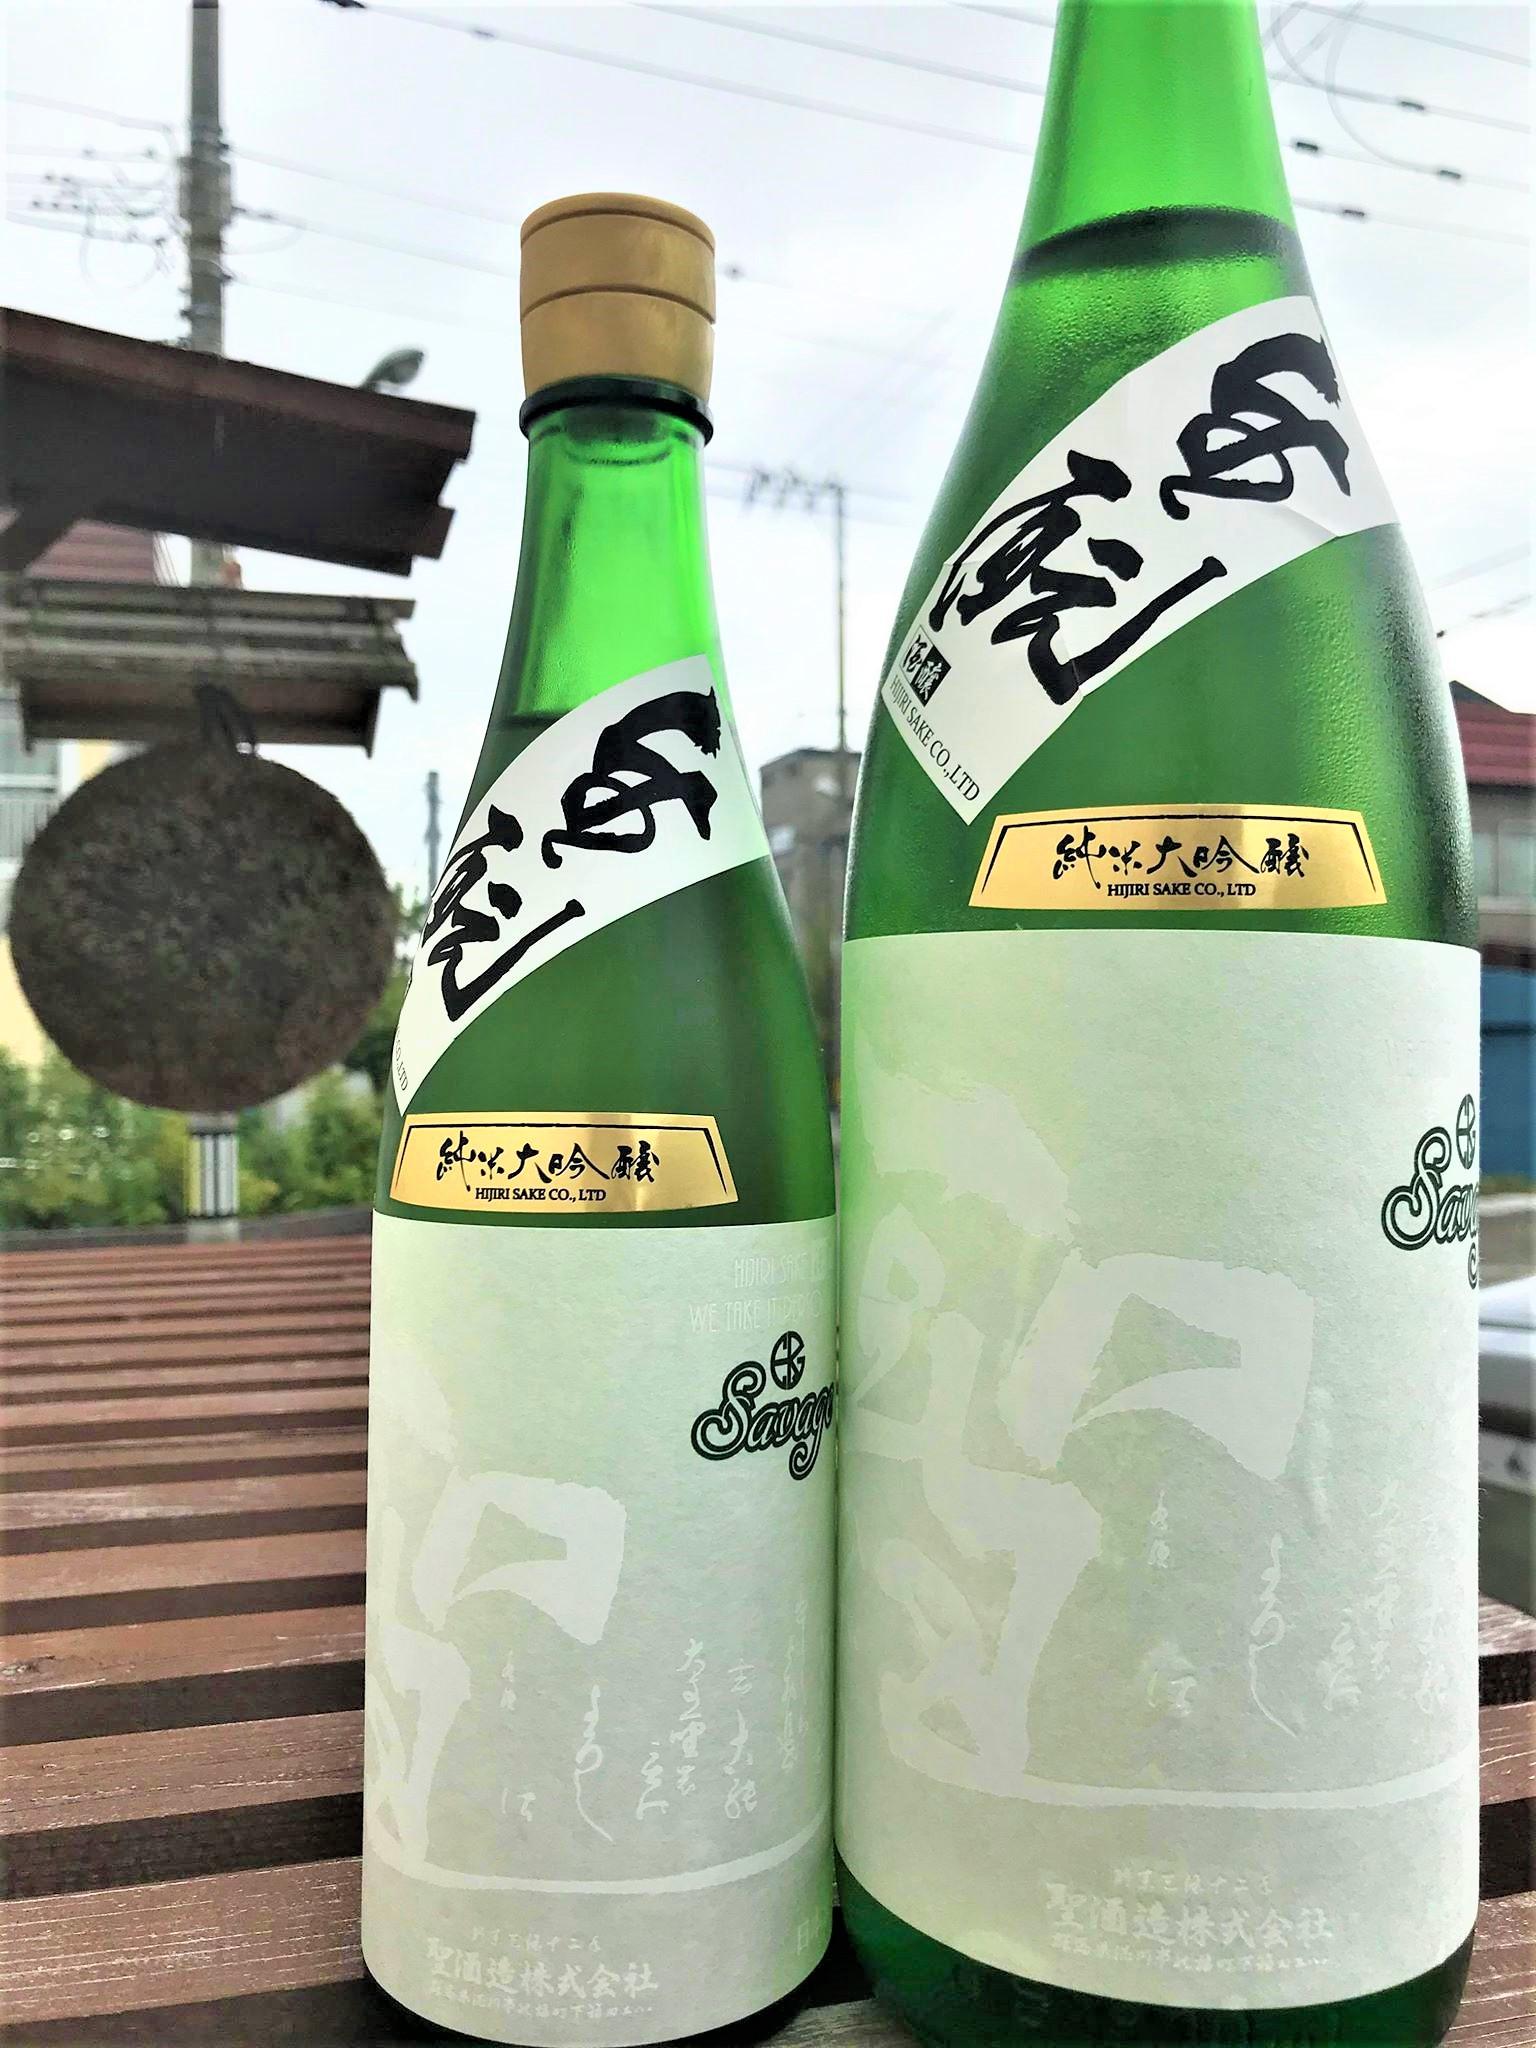 【日本酒】聖⭐特別編『Savege』生酛造り 純米大吟醸酒 The White Label 特別限定蔵出し 令和1BY🆕_e0173738_10261181.jpg